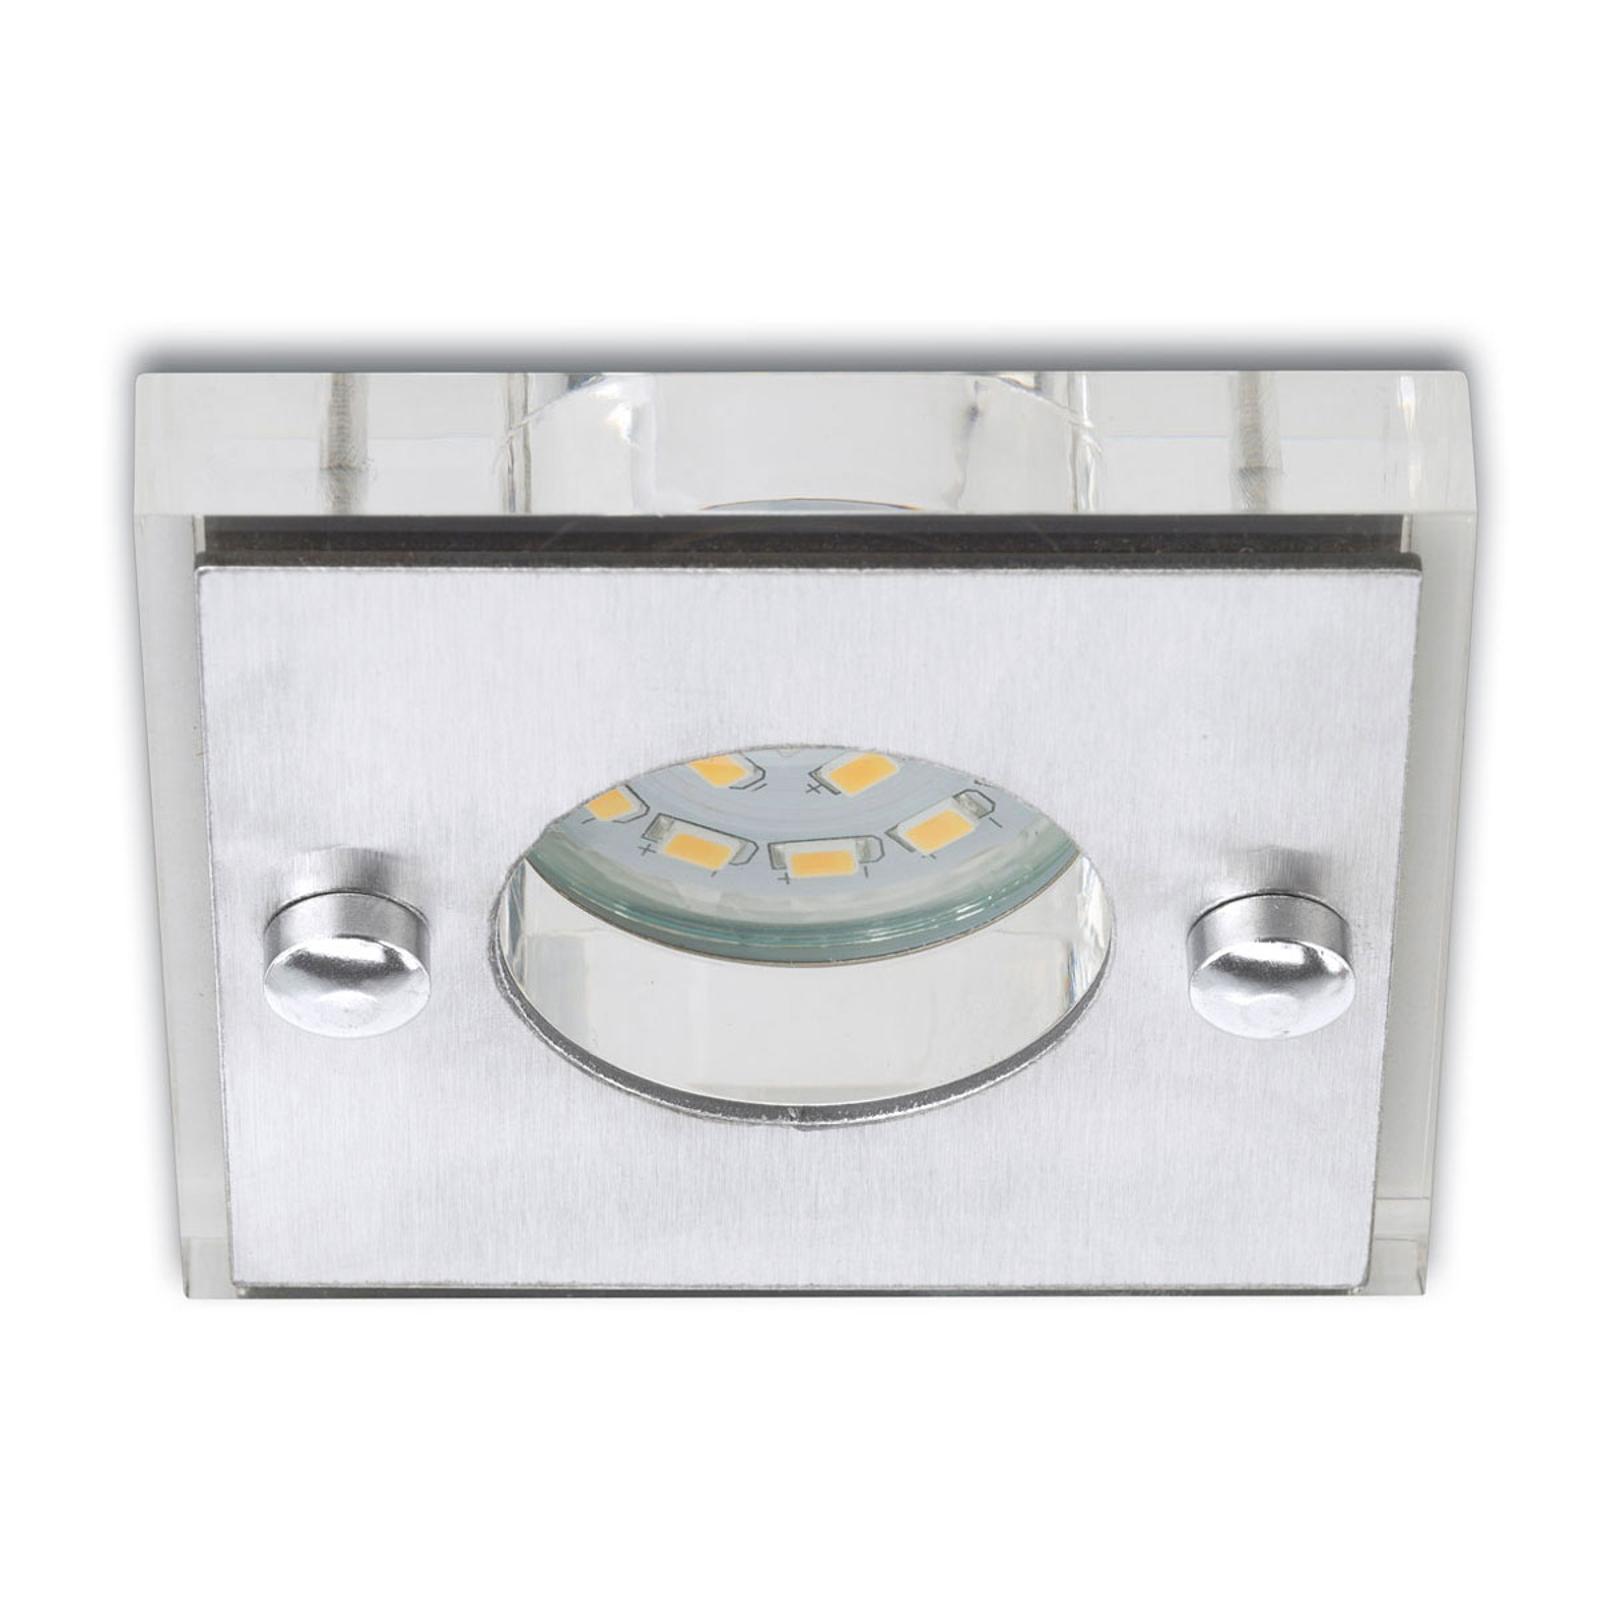 Firkantet - Nikas LED-indbygningsspot, mat nikkel